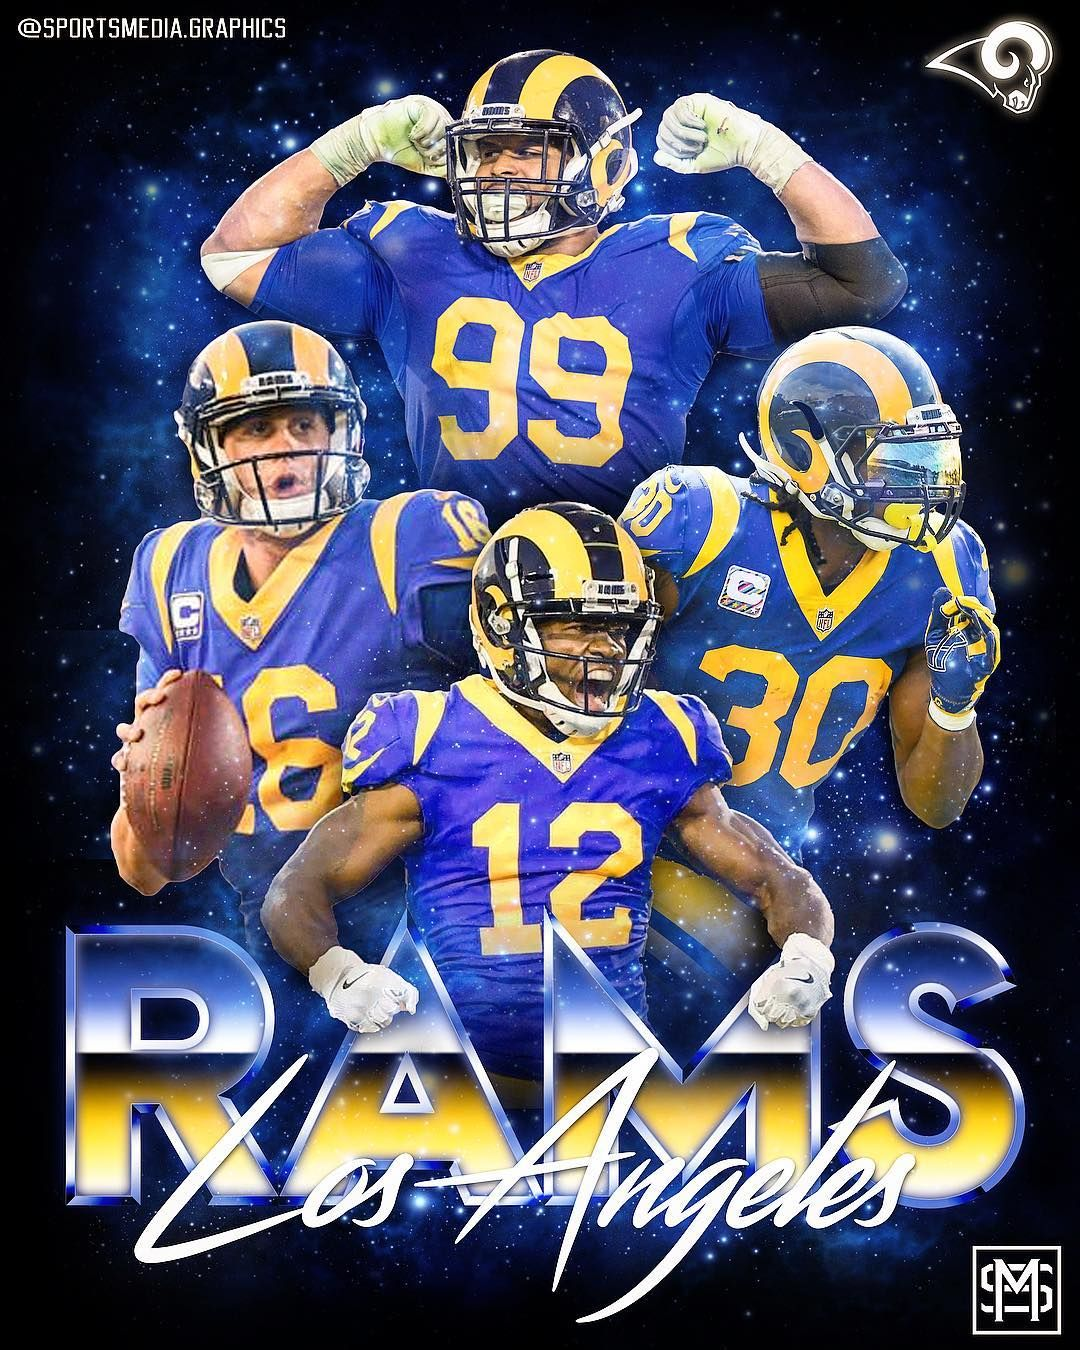 La Rams Design Who You Got Rams Or Cowboys Losangeles Rams Toddgurley Aarondonald Brandincooks Jaredg La Rams Football Memes Nfl Rams Football